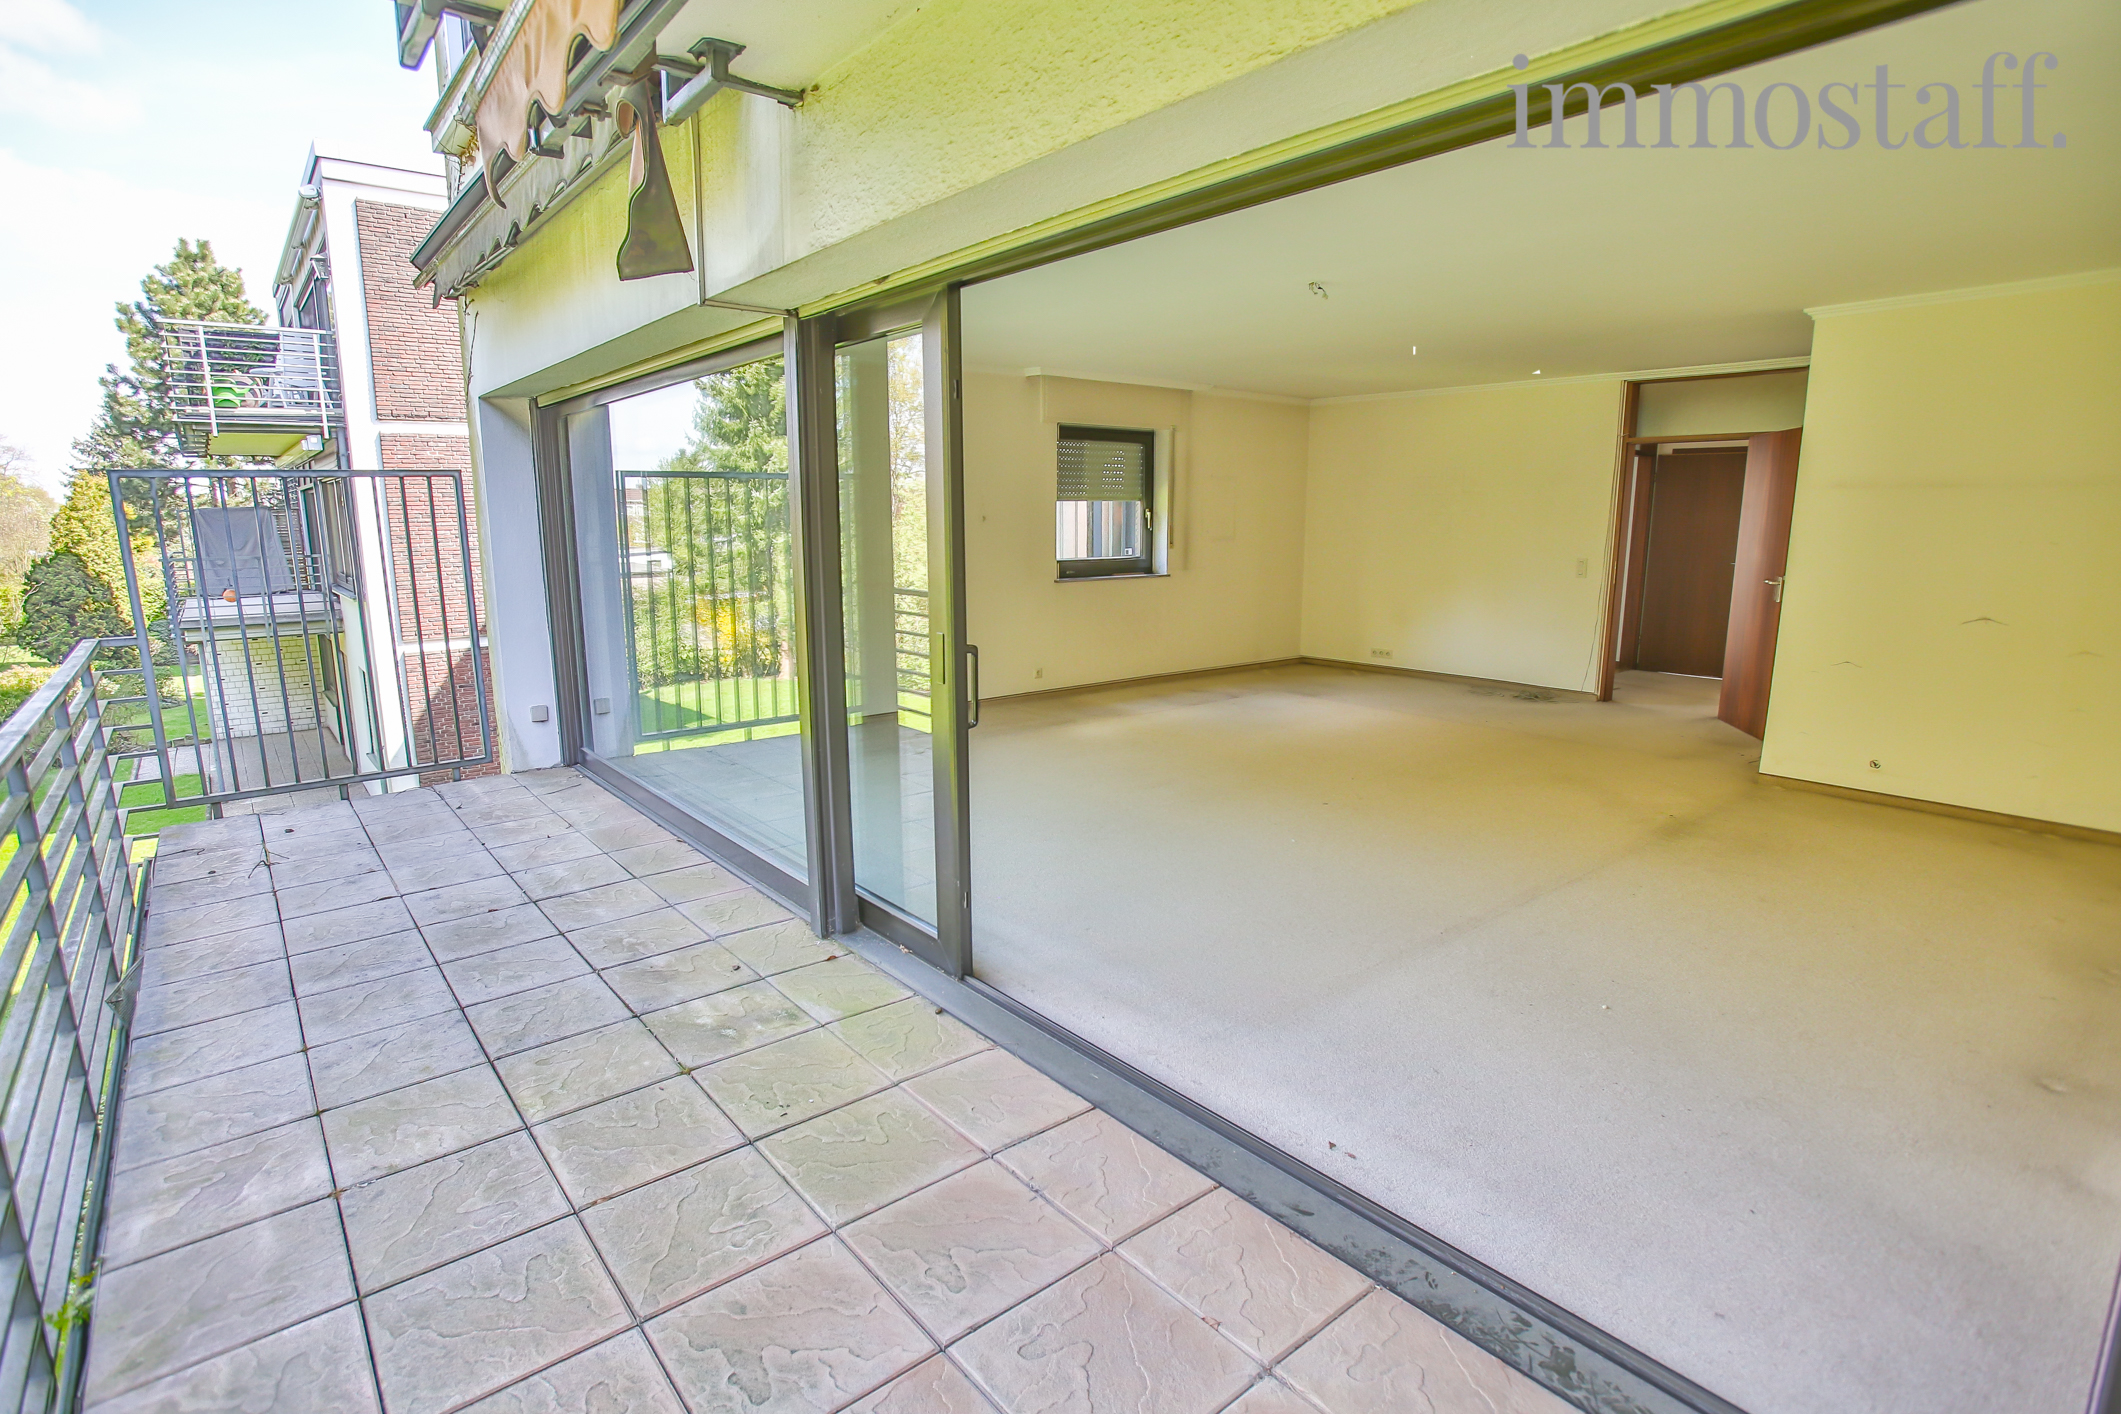 bottrop gro e eigentumswohnung in gr ner zentraler lage mit erdgeschosslage 2 balkons. Black Bedroom Furniture Sets. Home Design Ideas